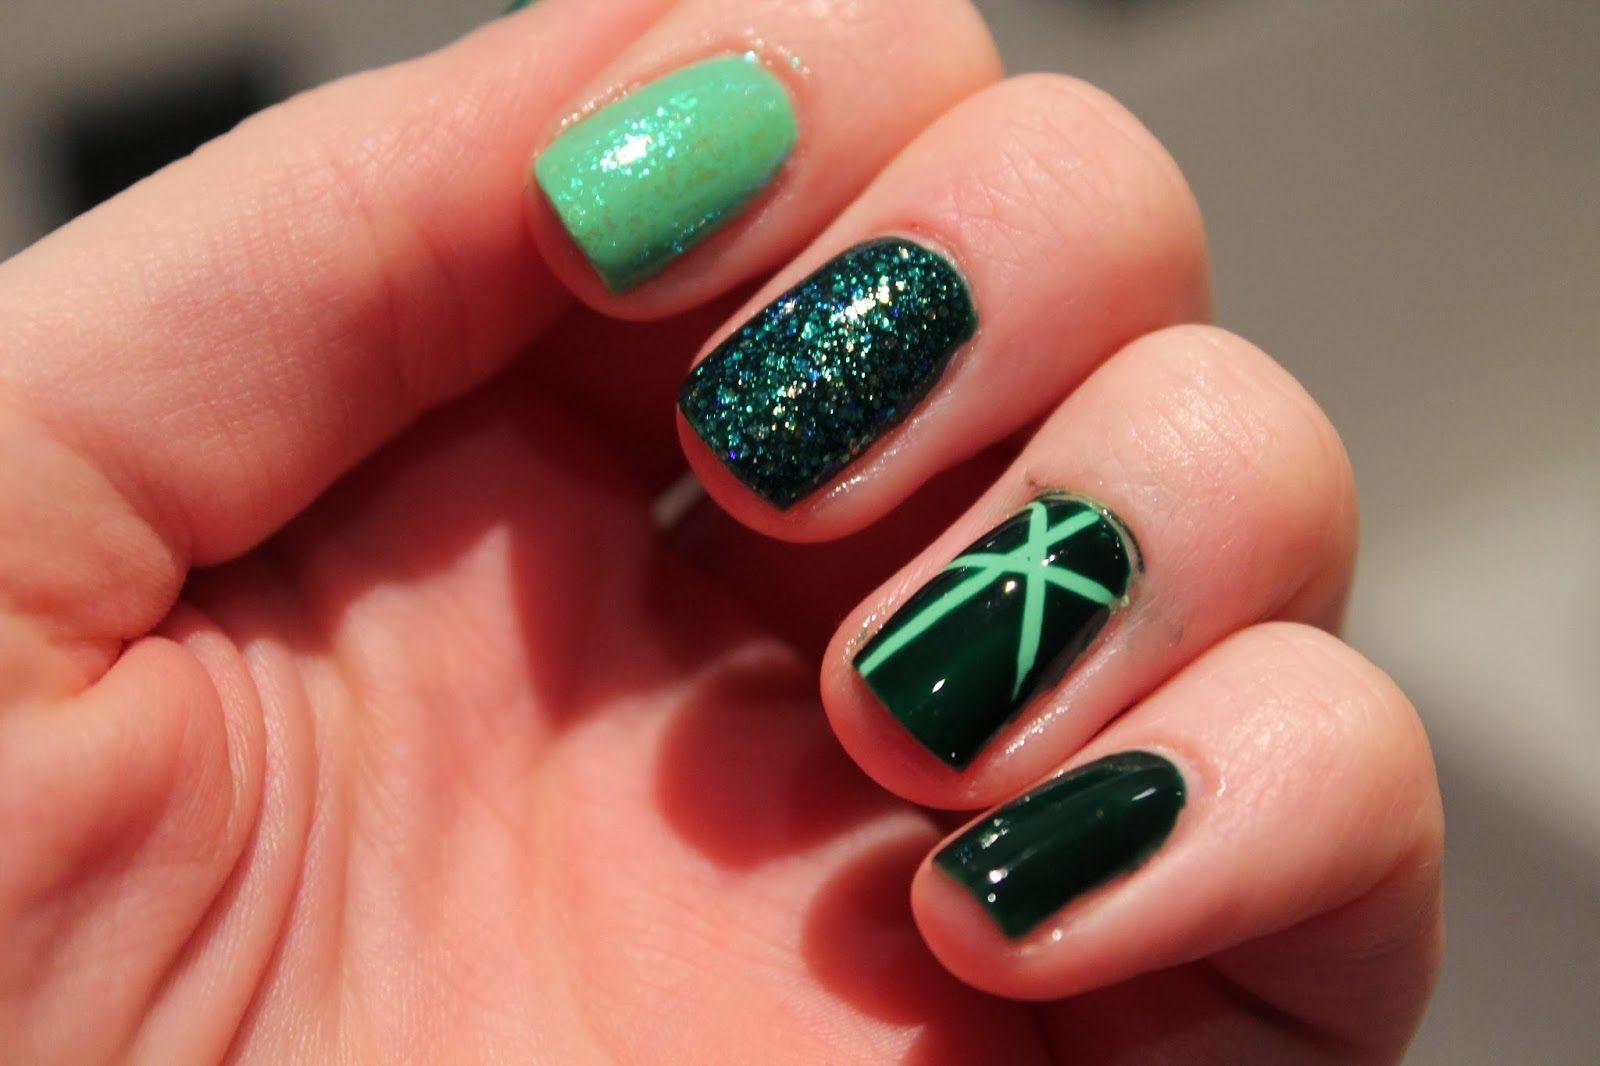 Nail Art - Green, Glitter, Stripes. Based on August birthstone ...